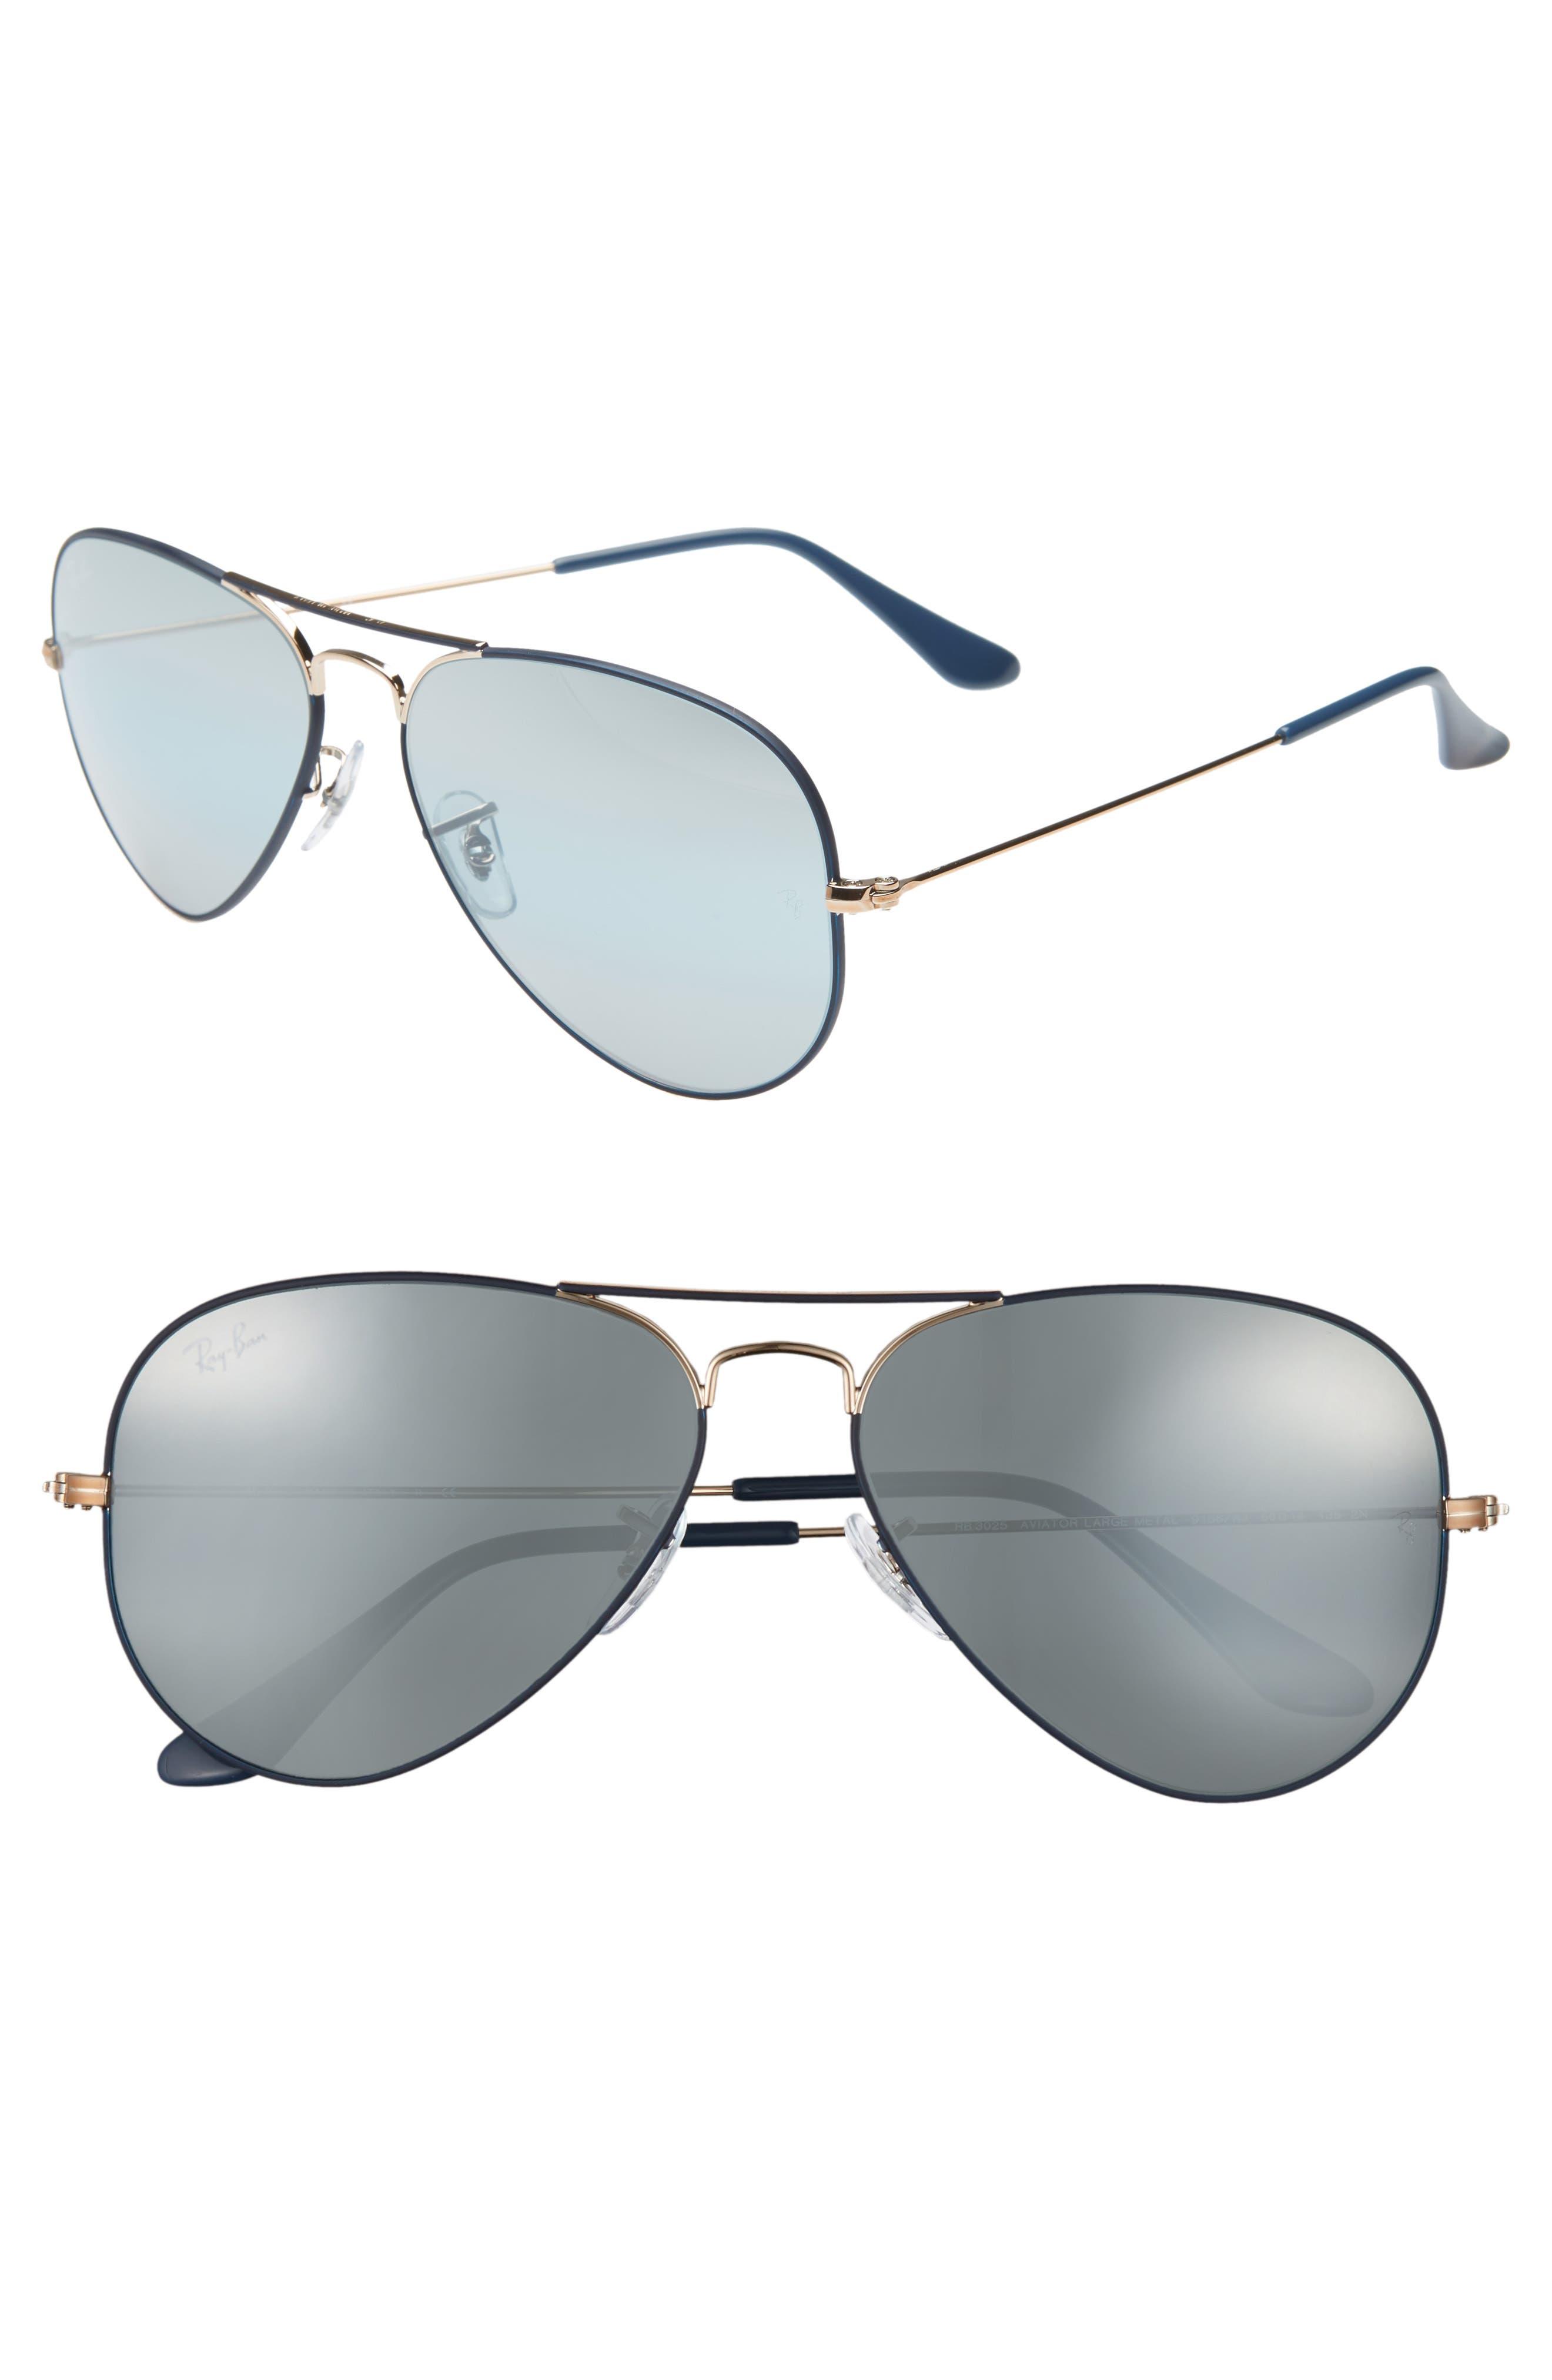 Ray-Ban Original Aviator 5m Sunglasses - Dark Blue